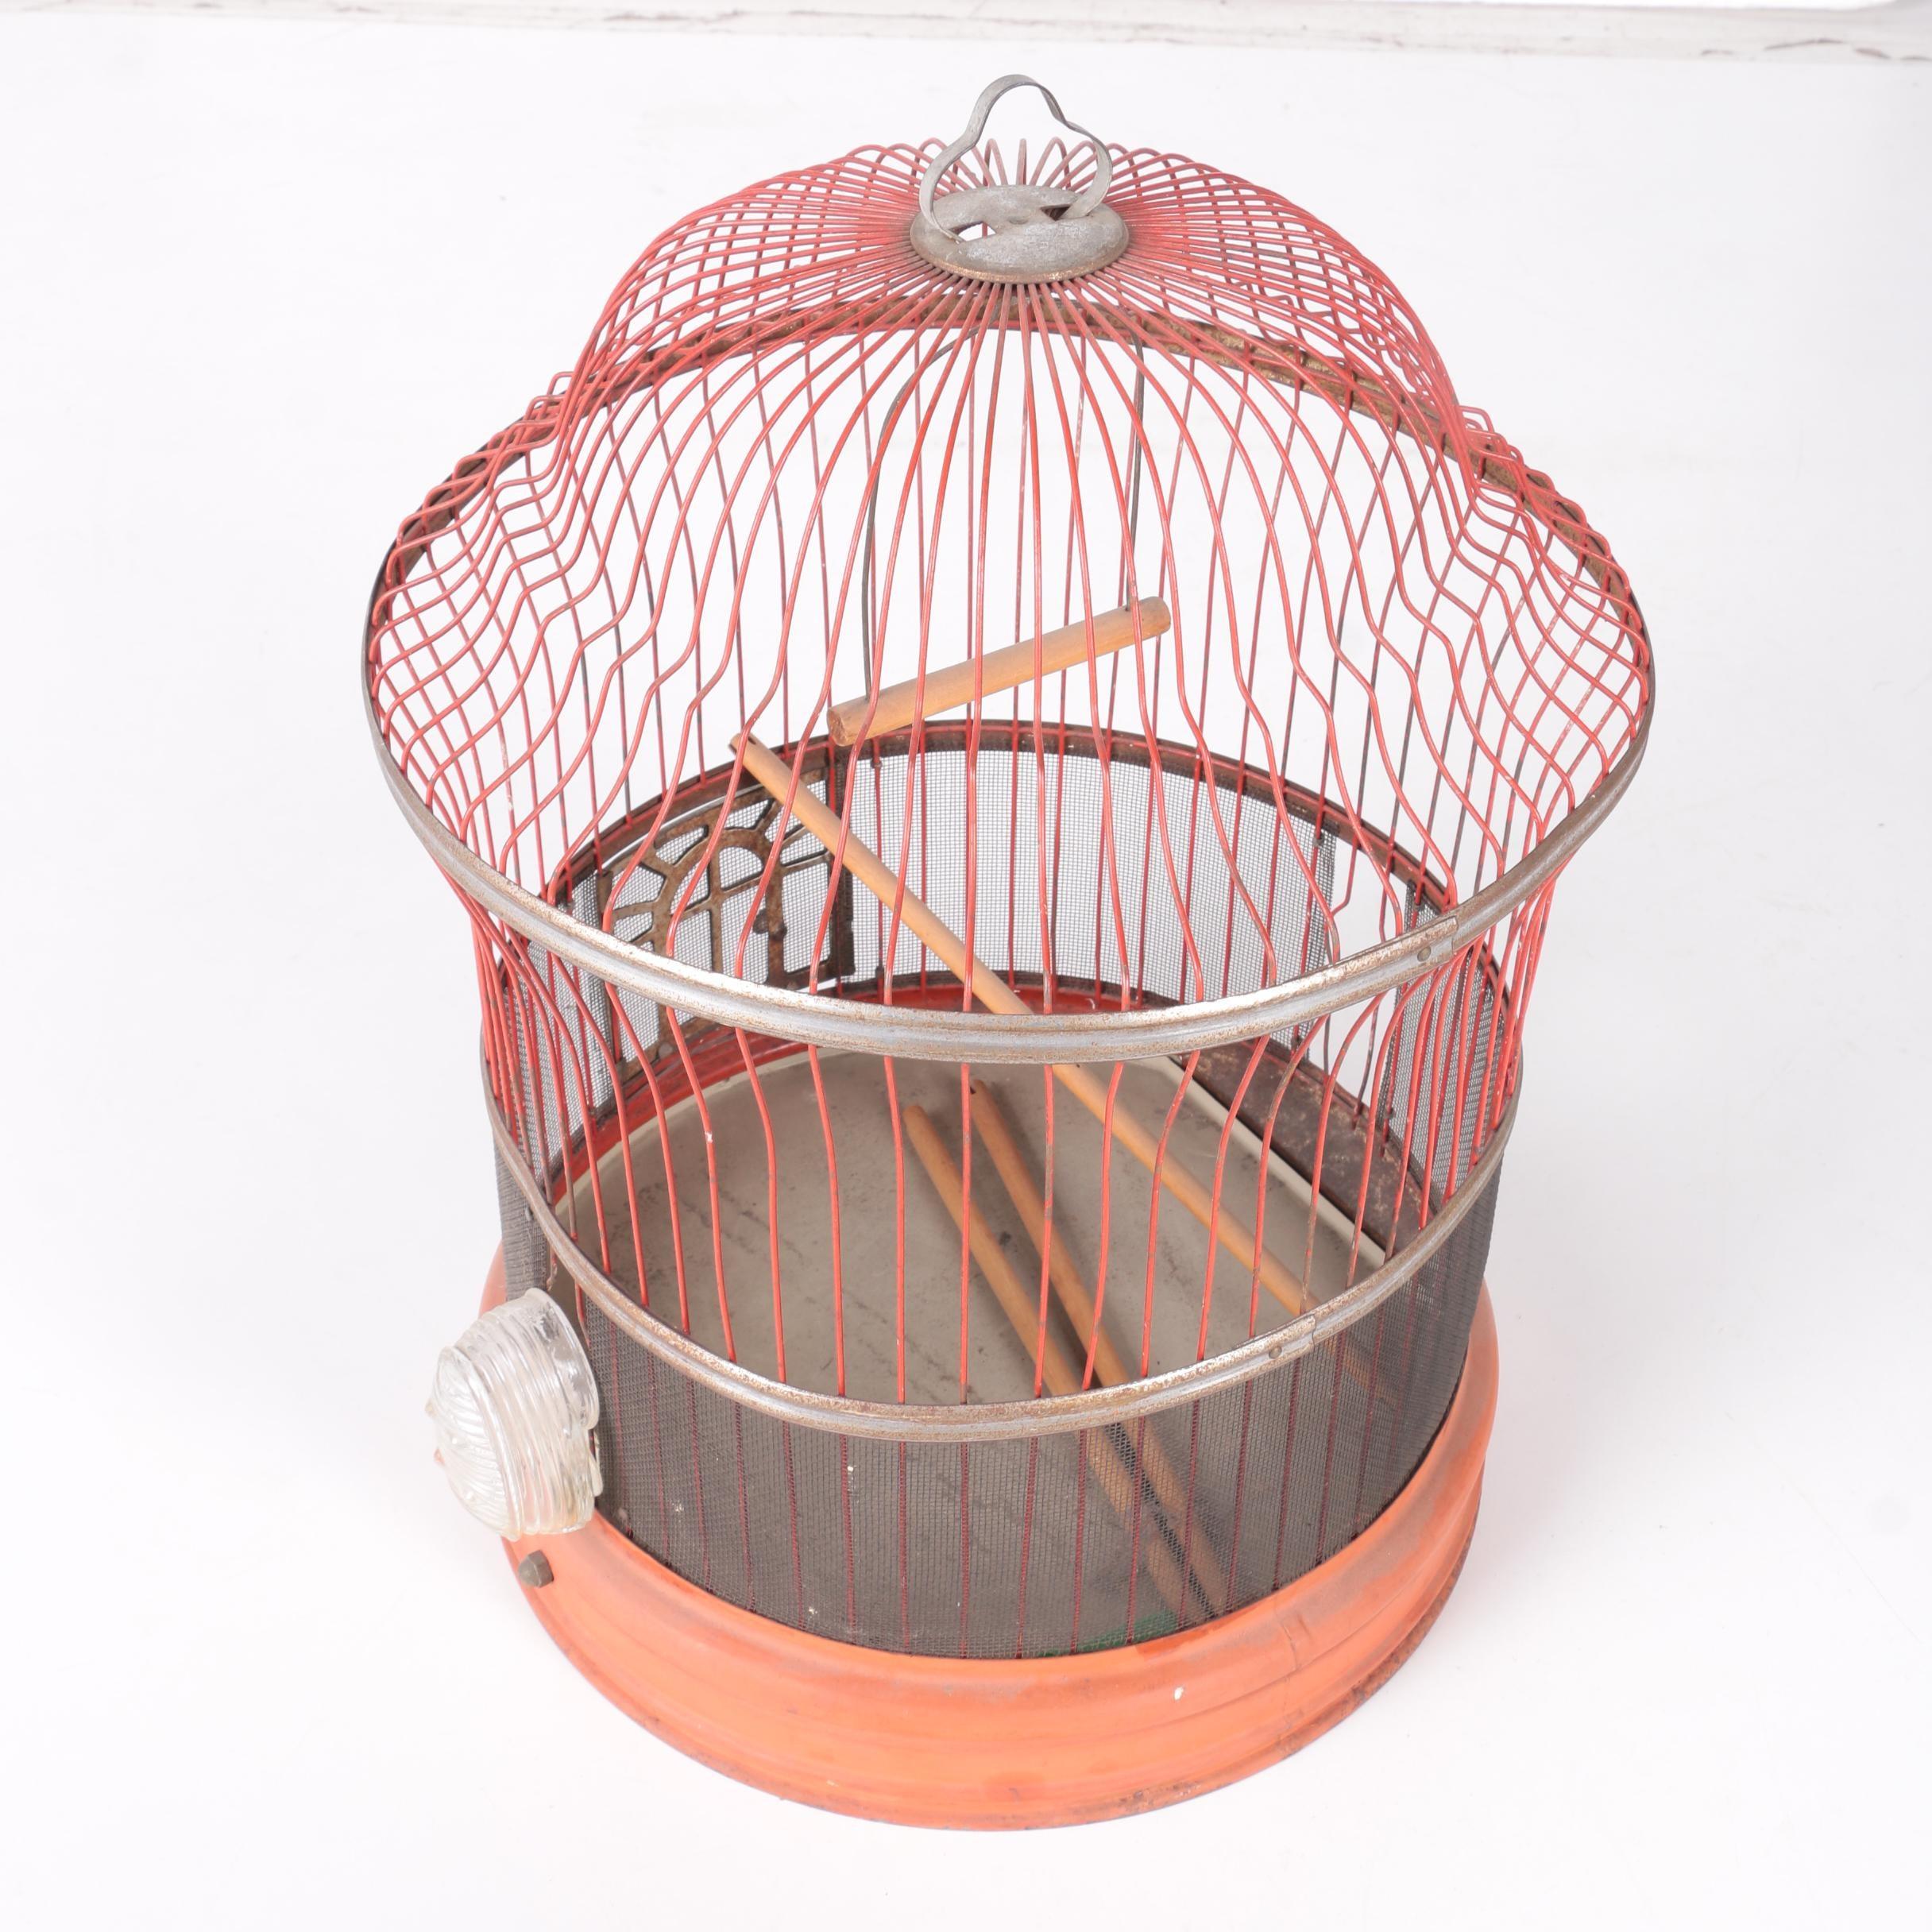 Vintage Red Metal Bird Cage